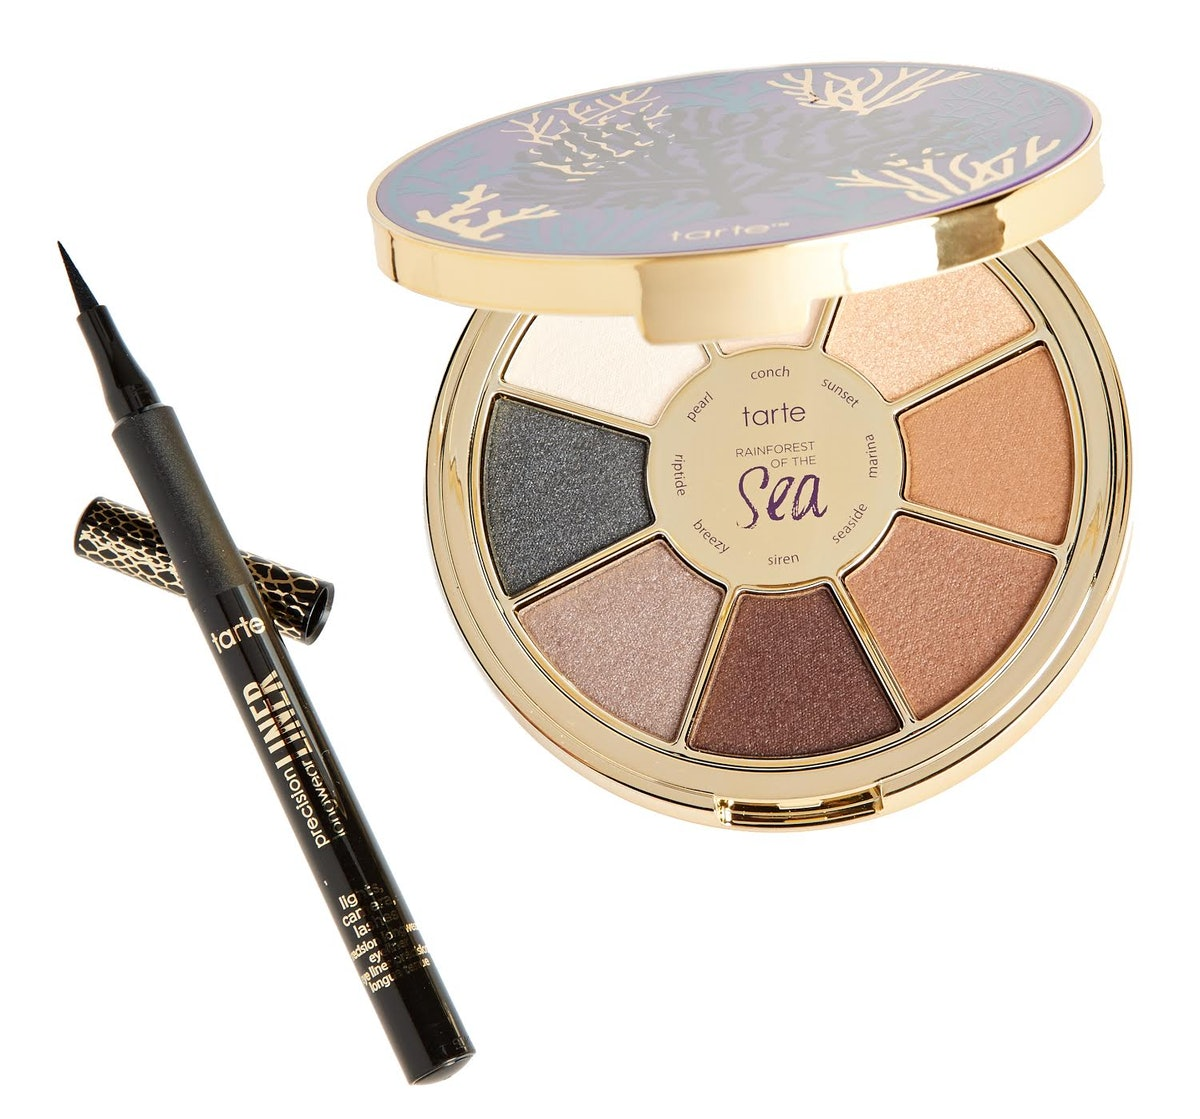 tarte ROS Eyeshadow Palette V2 and LCL Liner 2-piece Set